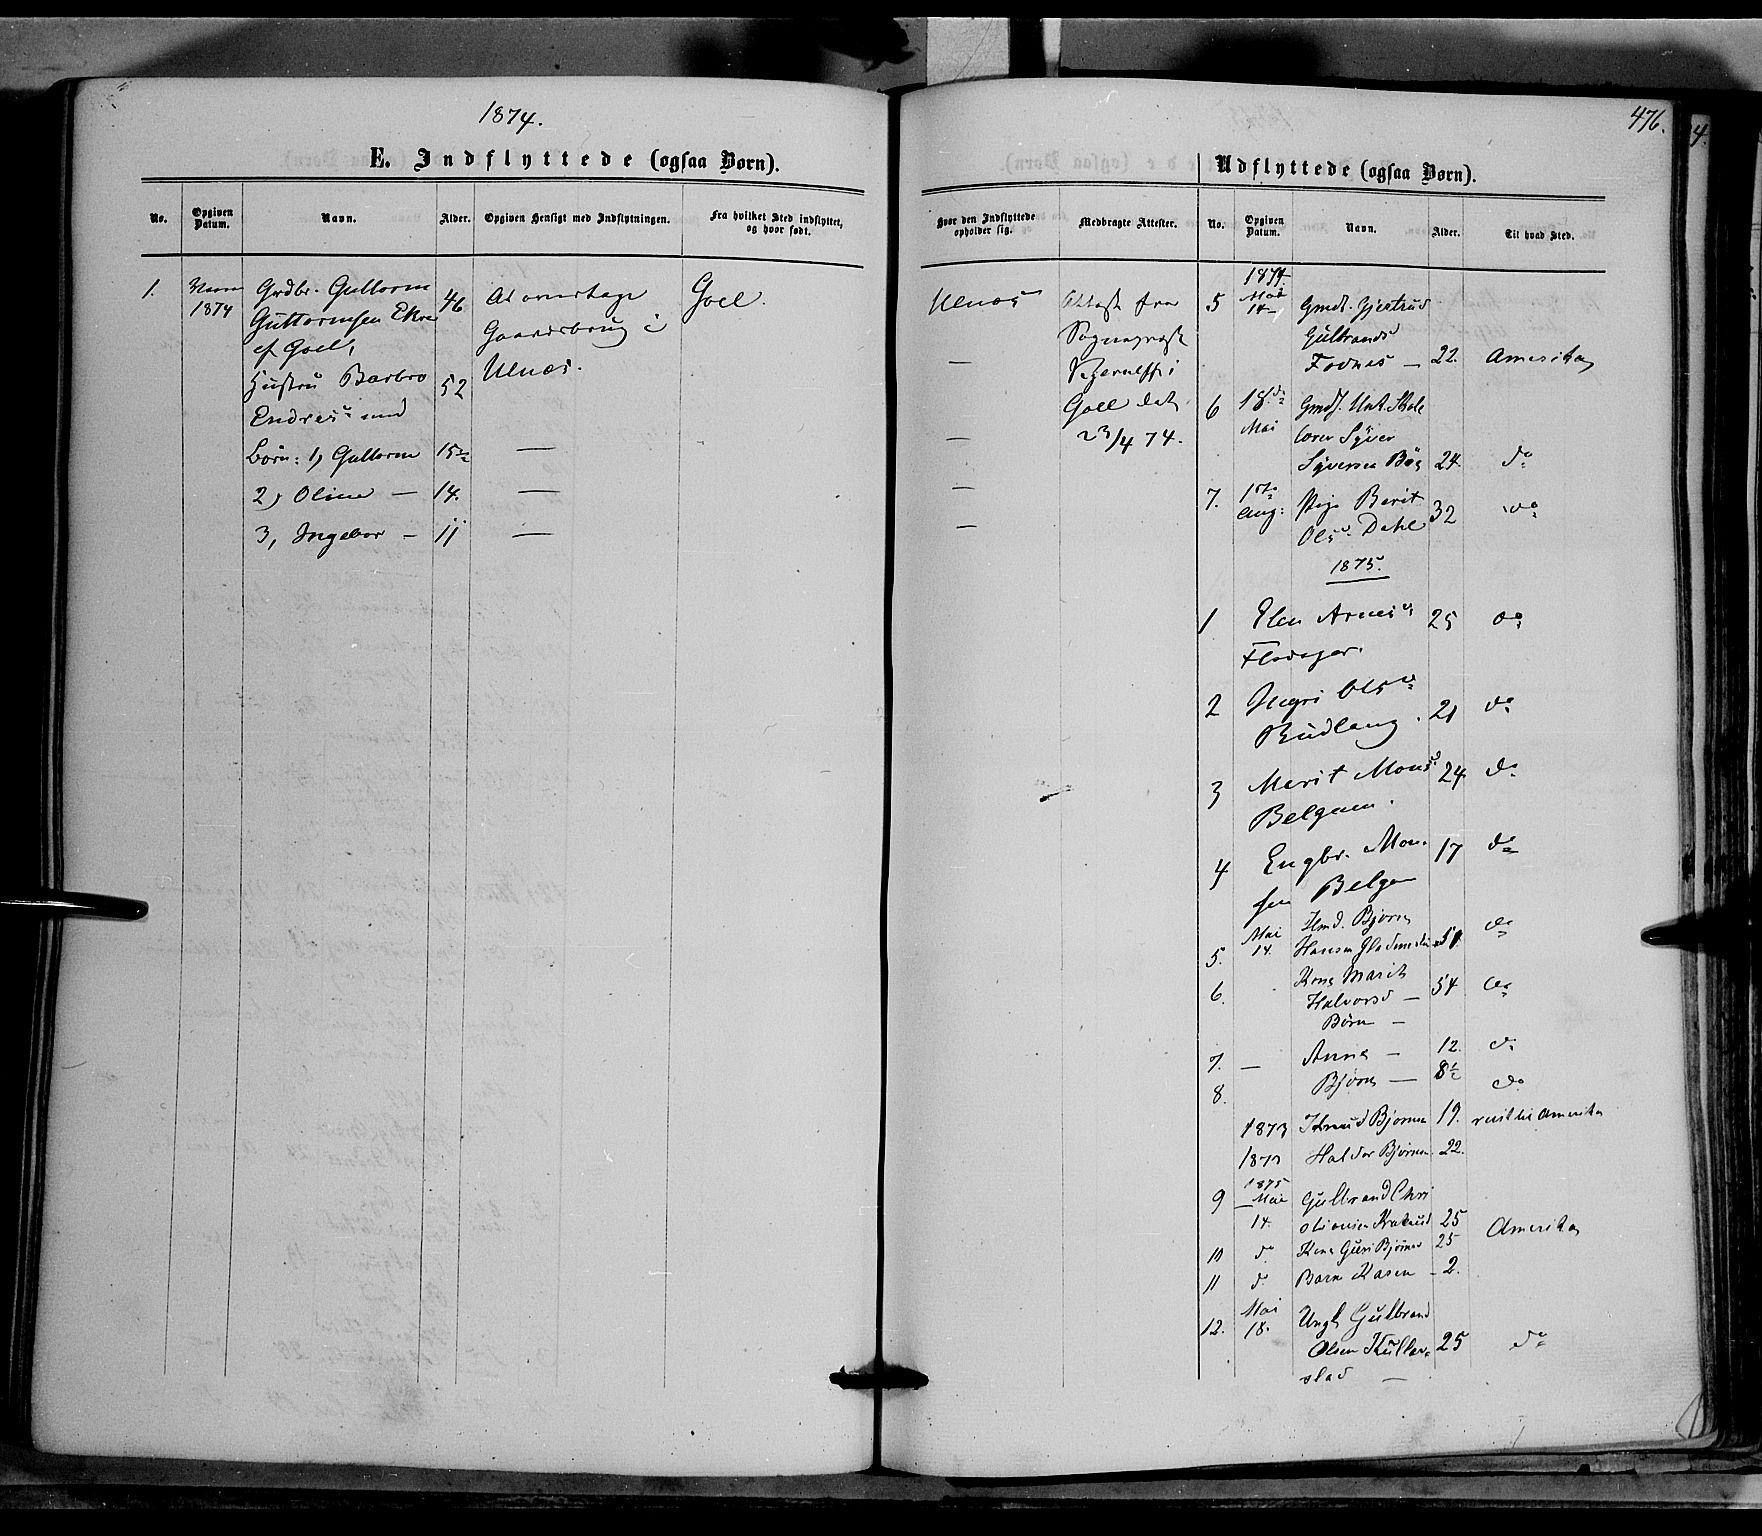 SAH, Nord-Aurdal prestekontor, Ministerialbok nr. 8, 1863-1875, s. 476